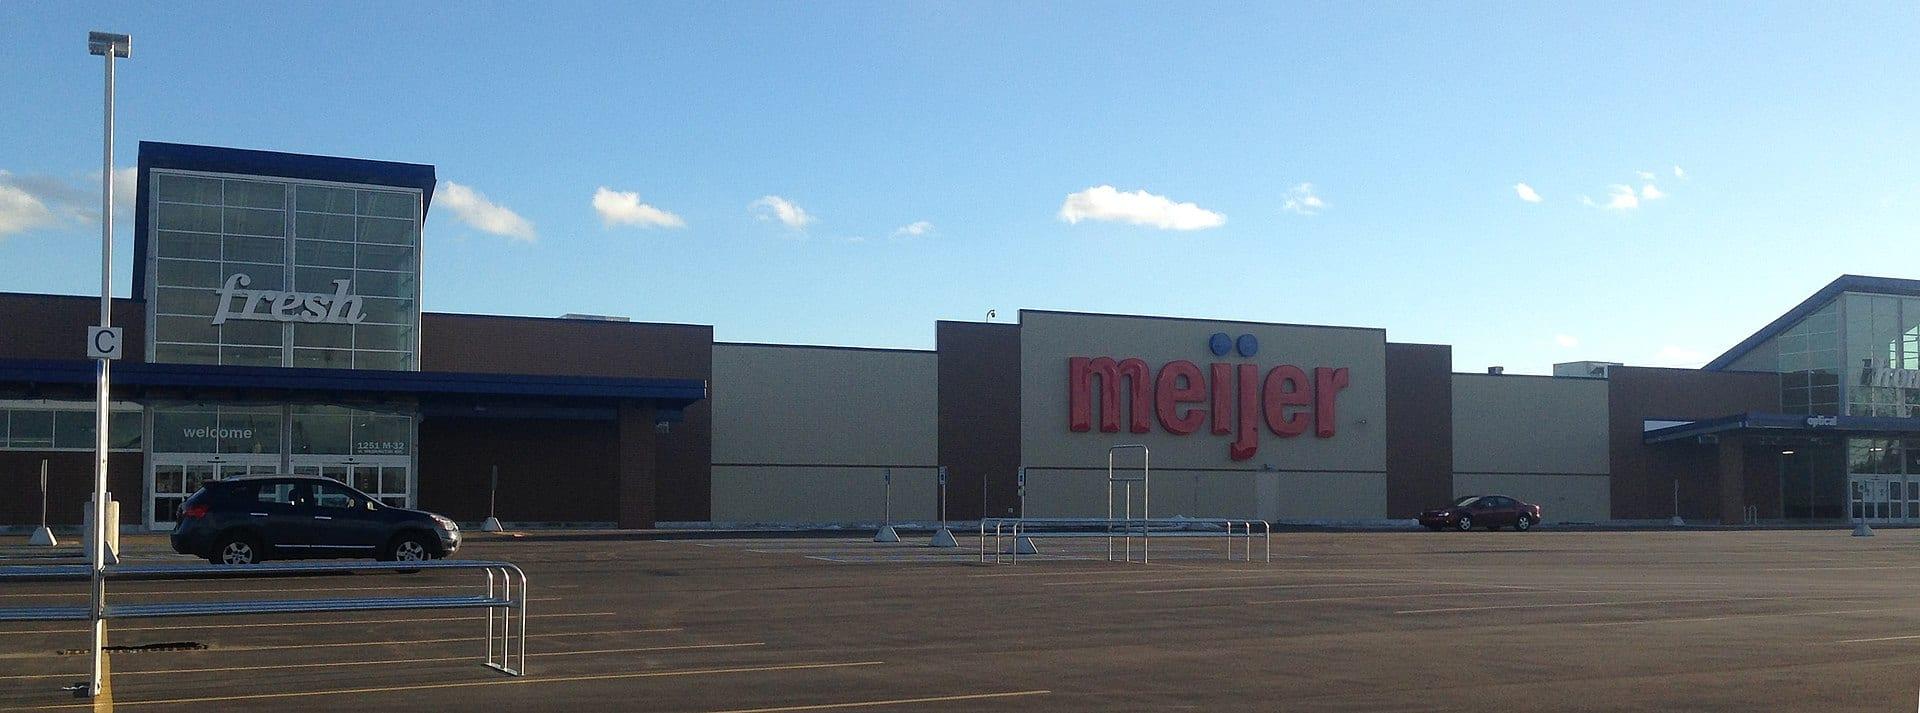 Meijer store in Alpena, Michigan